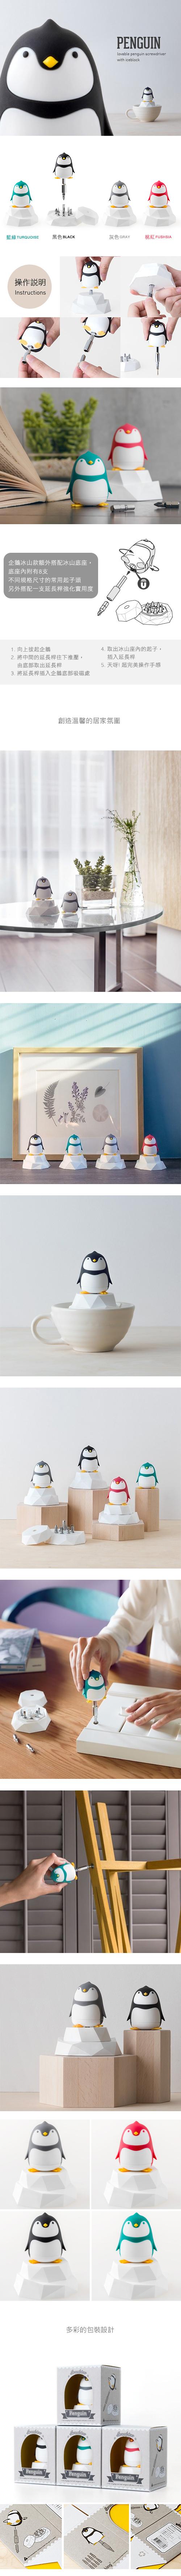 iThinking 企鵝螺絲起子組 冰山款 (8入) 黑